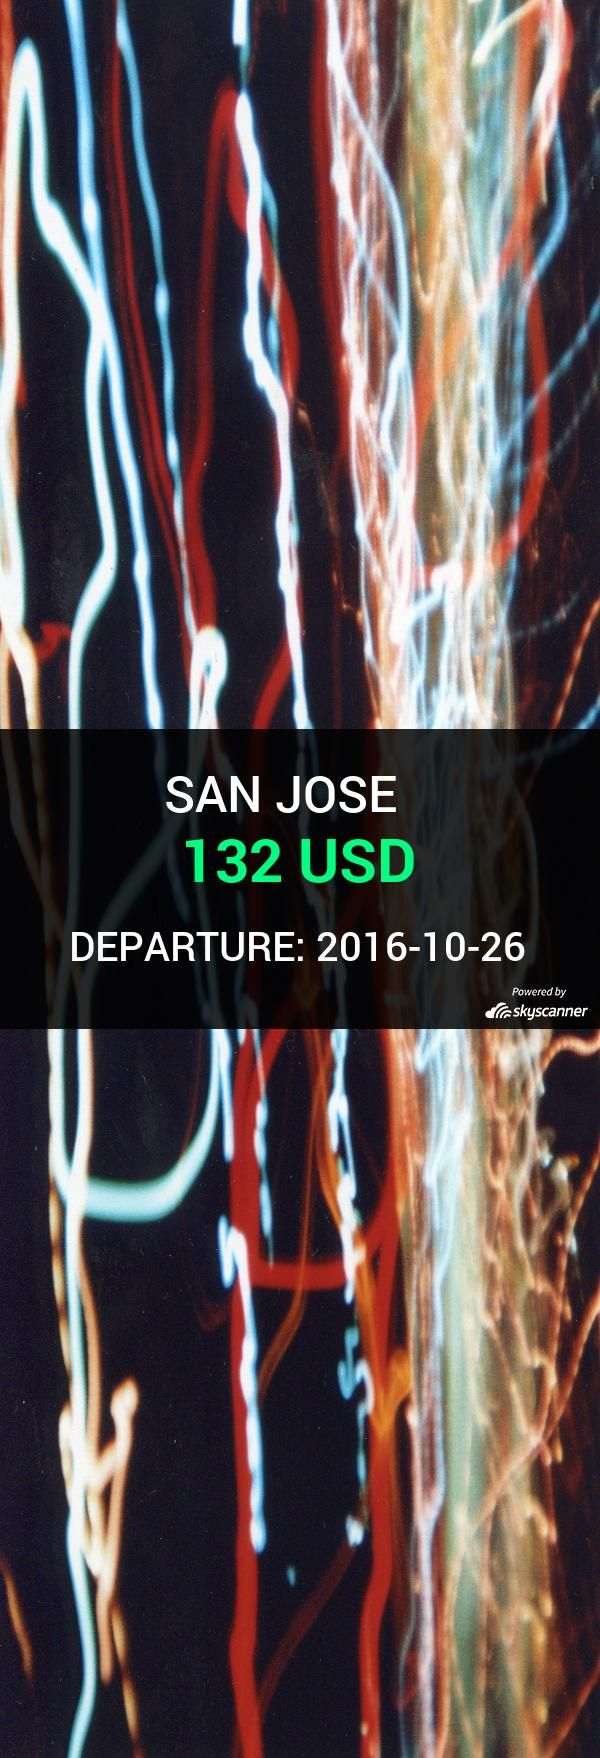 Flight from Atlanta to San Jose by Spirit Airlines #travel #ticket #flight #deals   BOOK NOW >>>